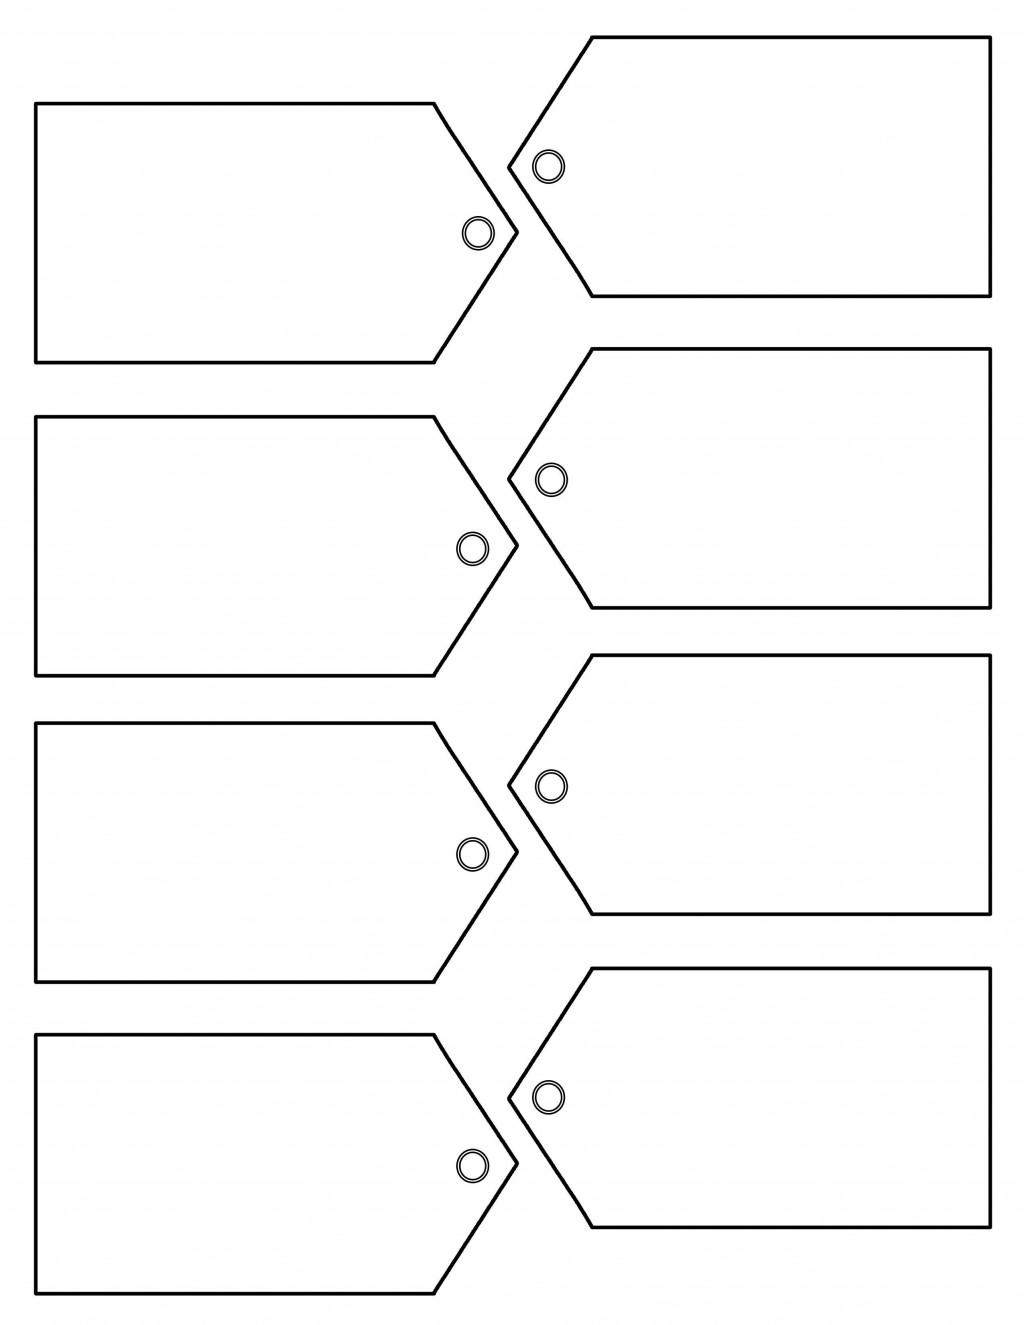 000 Stunning Free Gift Tag Template Design  Templates Downloadable Christma Printable For Word To PrintLarge